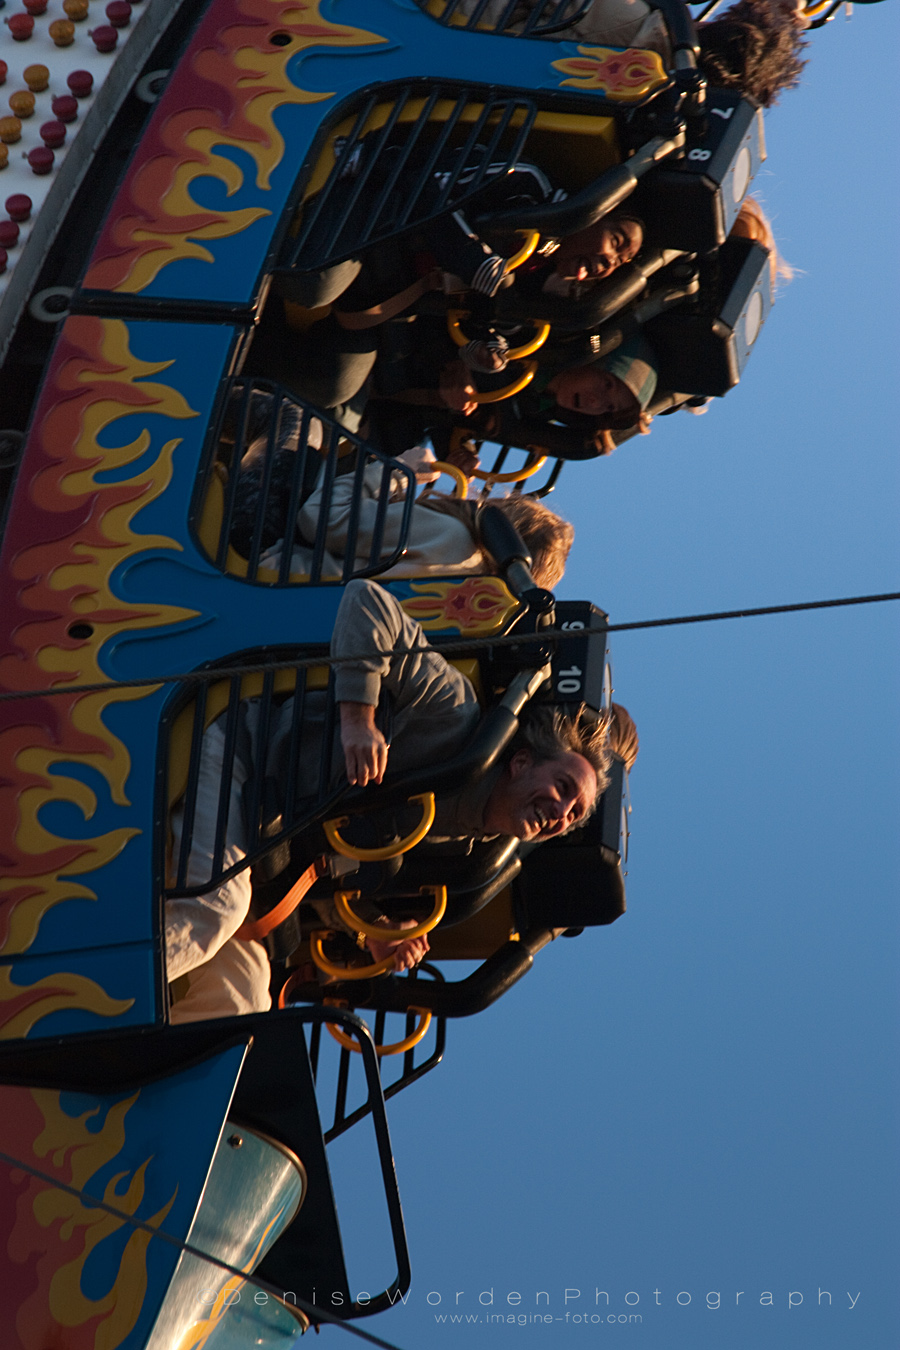 Fair goers enjoy the ride